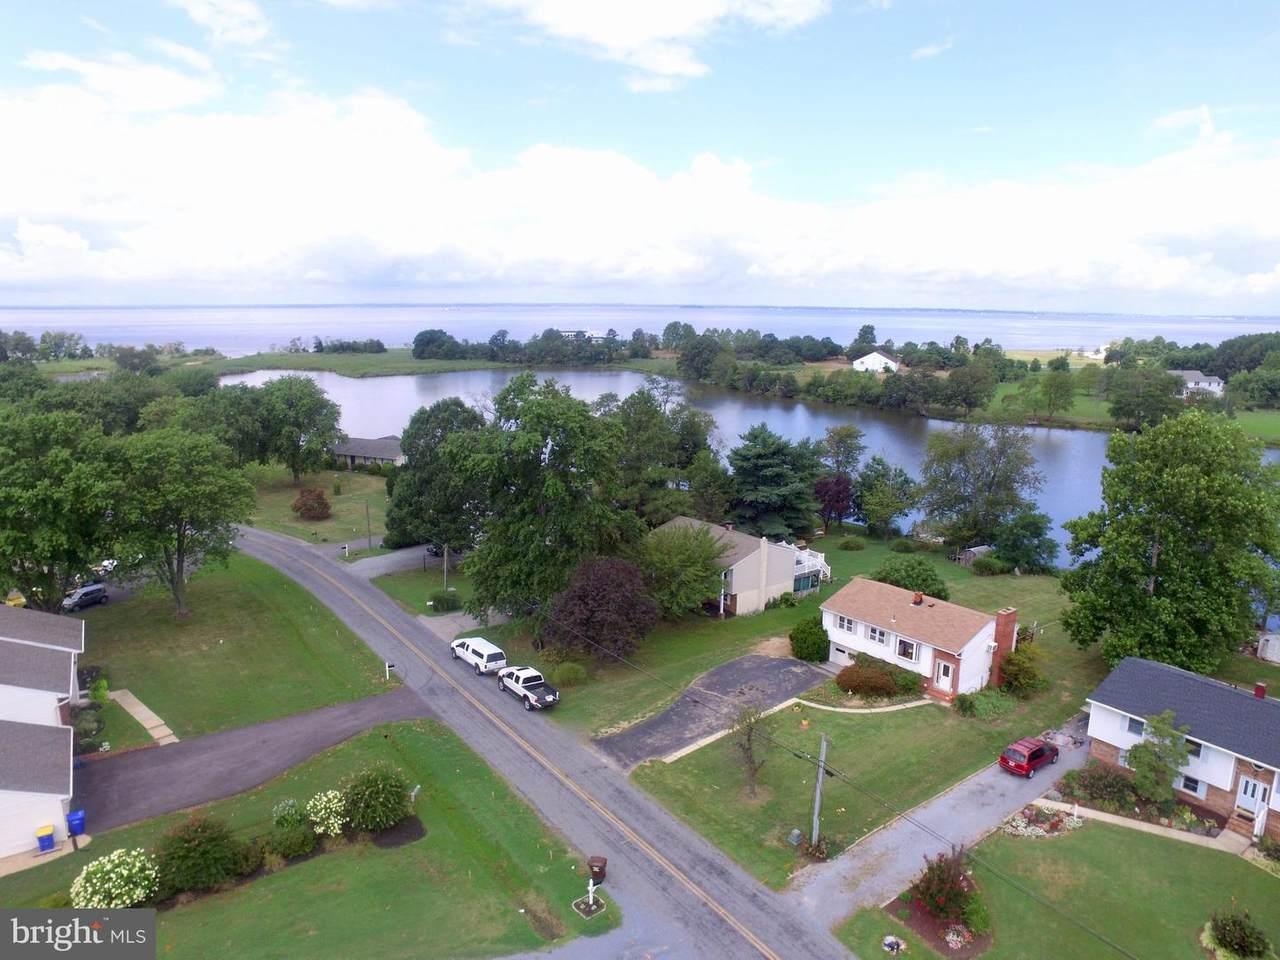 142 Lake Drive - Photo 1